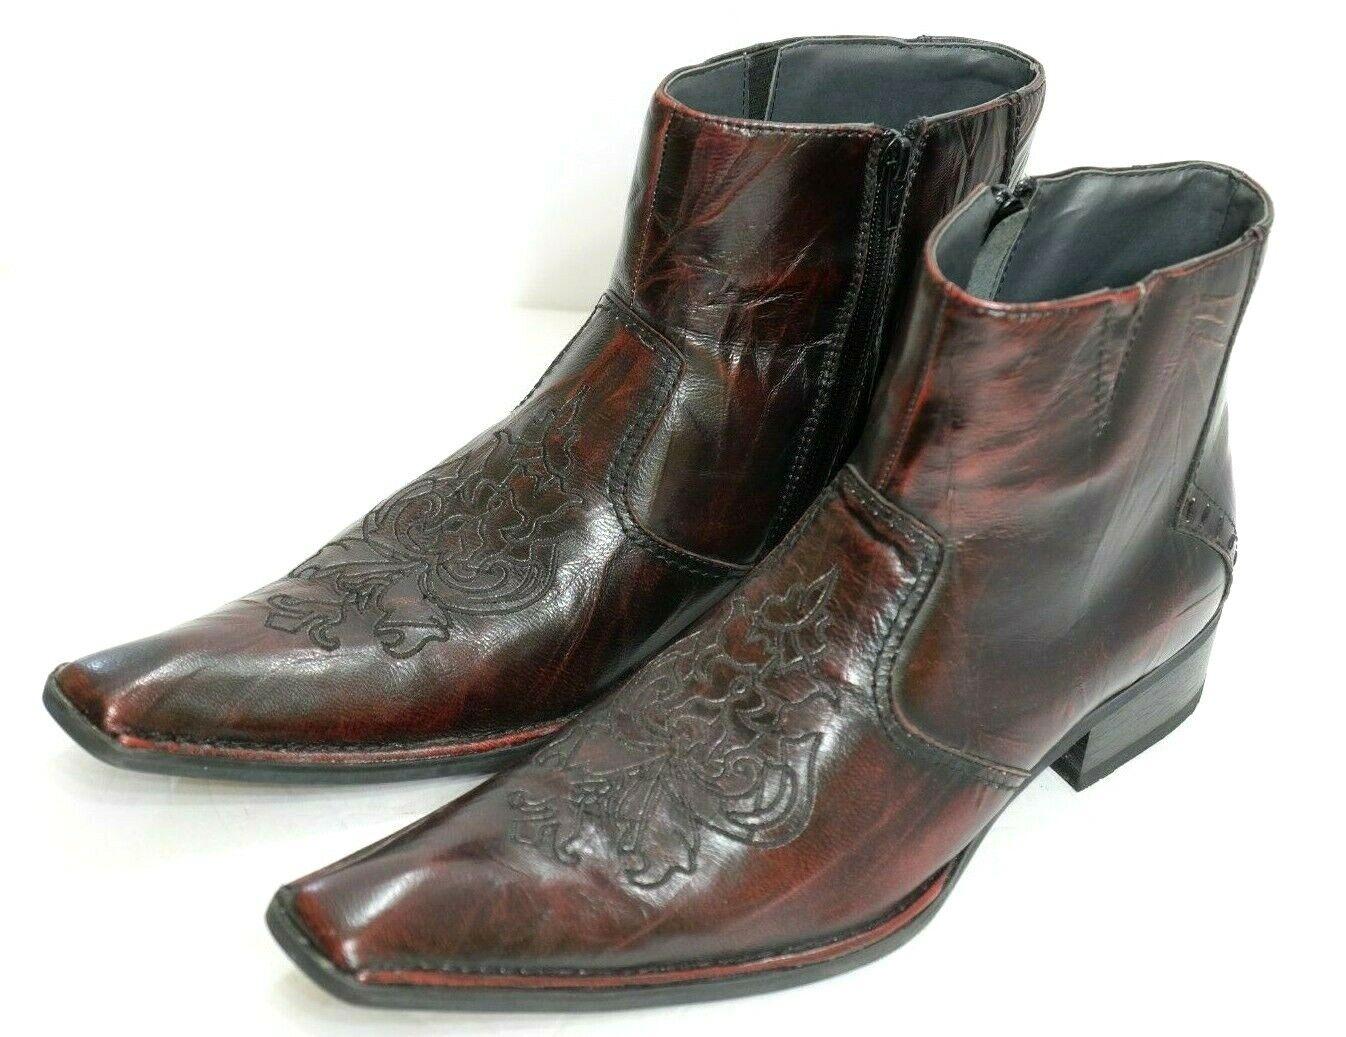 EUC Giorgio Brutini Men's Size 8.5M Handsome Reddish Brown Tooled Leather Boots